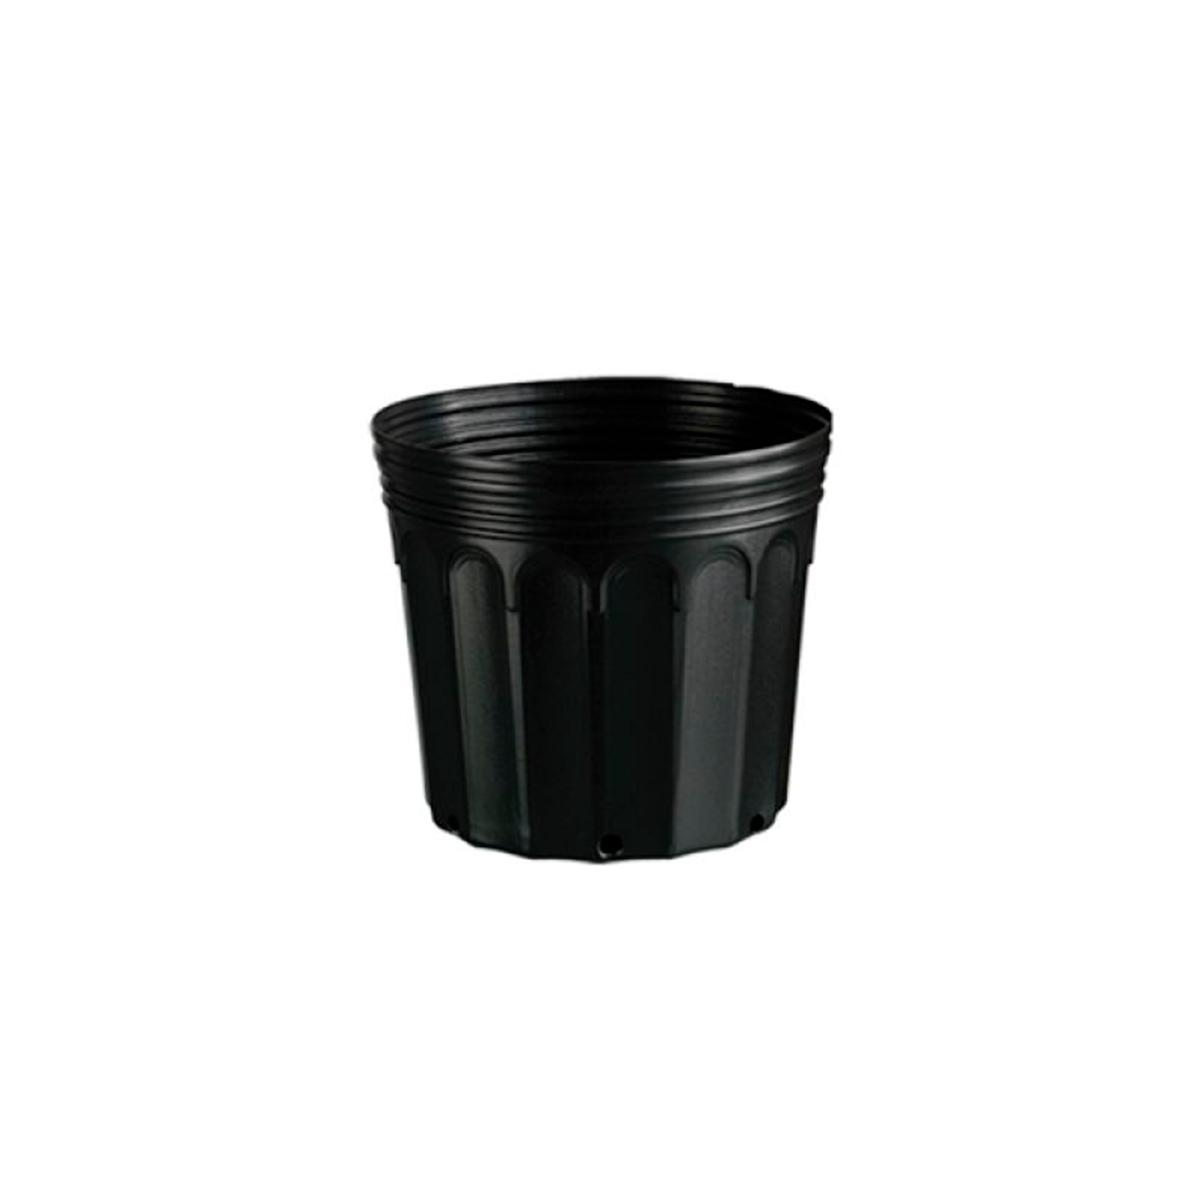 Kit 500 Embalagem para Mudas Flexível Plástico 8,5L